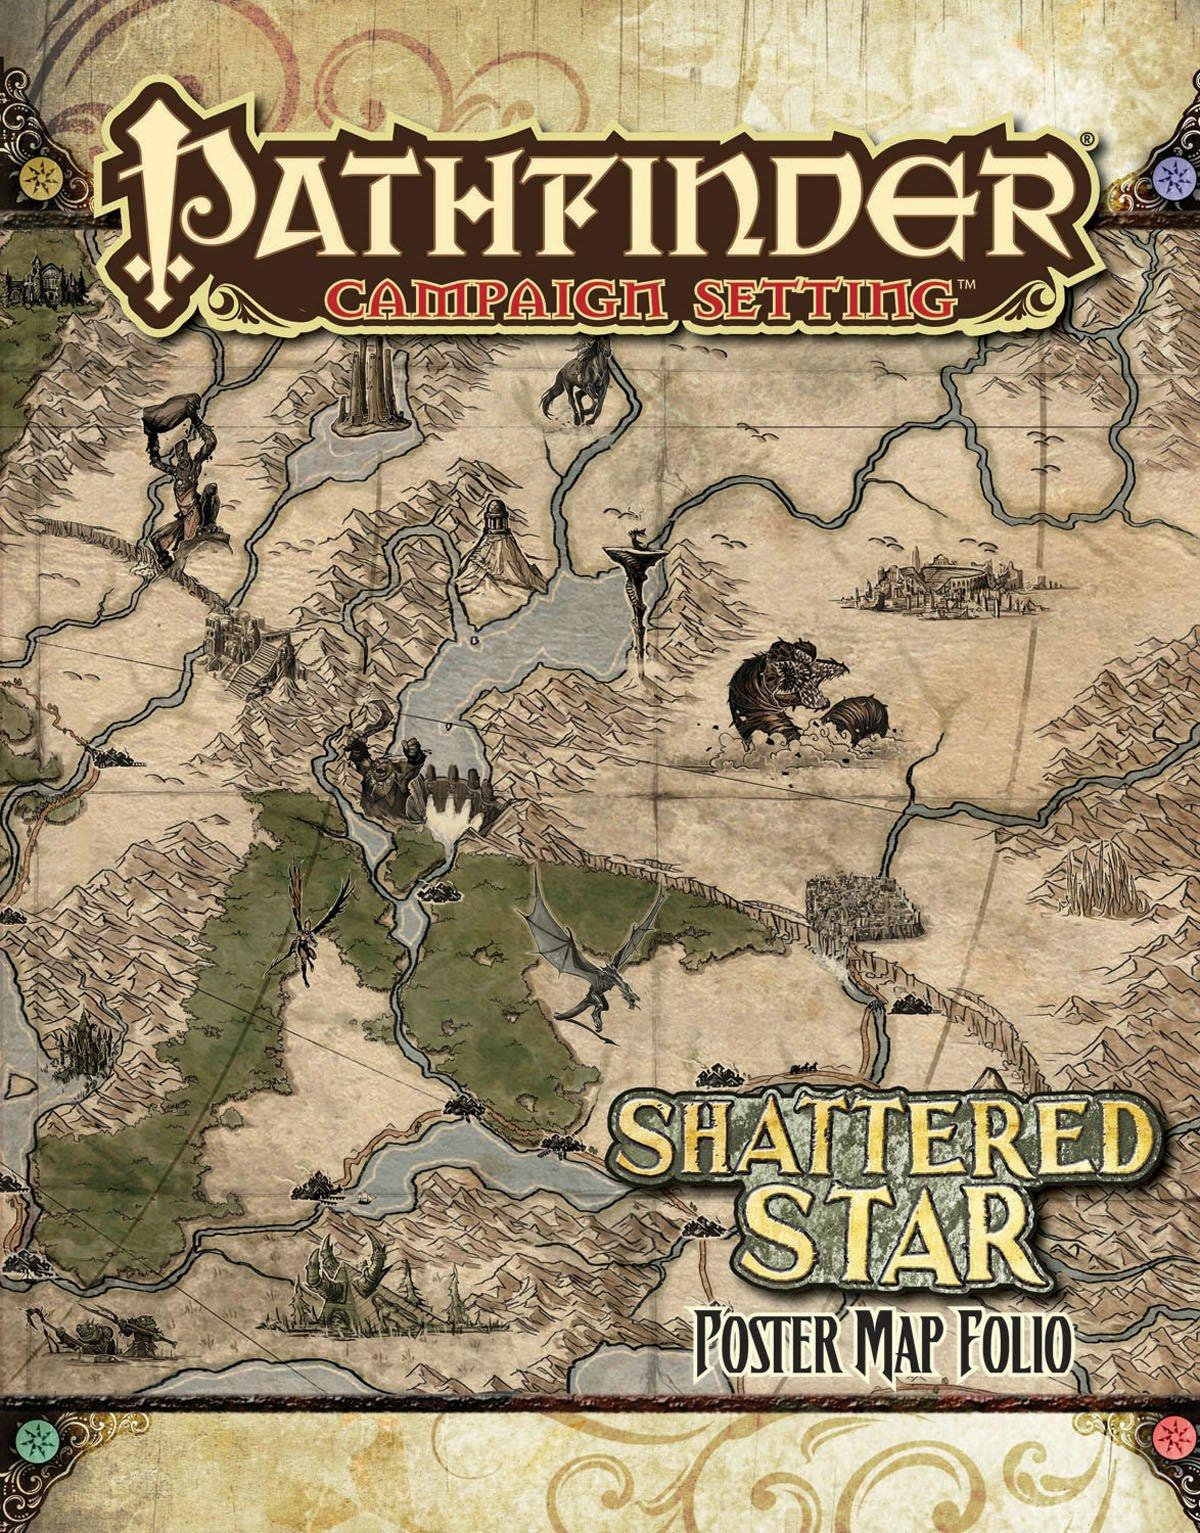 Pathfinder Campaign Setting: Shattered Star Poster Map Folio: Amazon.de:  Paizo Staff, Robert Lazzaretti: Fremdsprachige Bücher